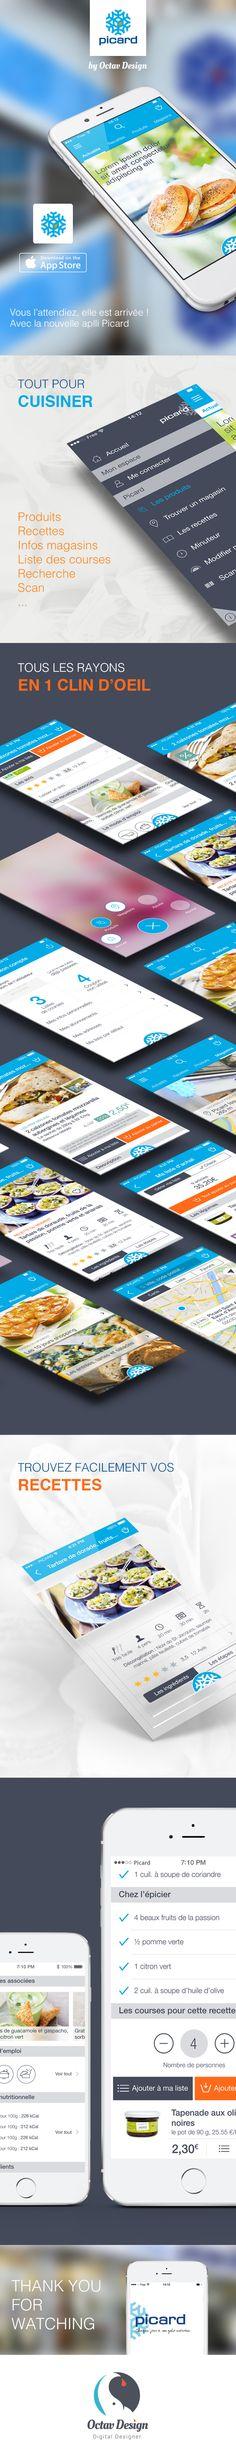 Picard App ios8 #ios8 #ios #iphone6 #iphone #app #interface #flatdesign #menu #ux #ui #design